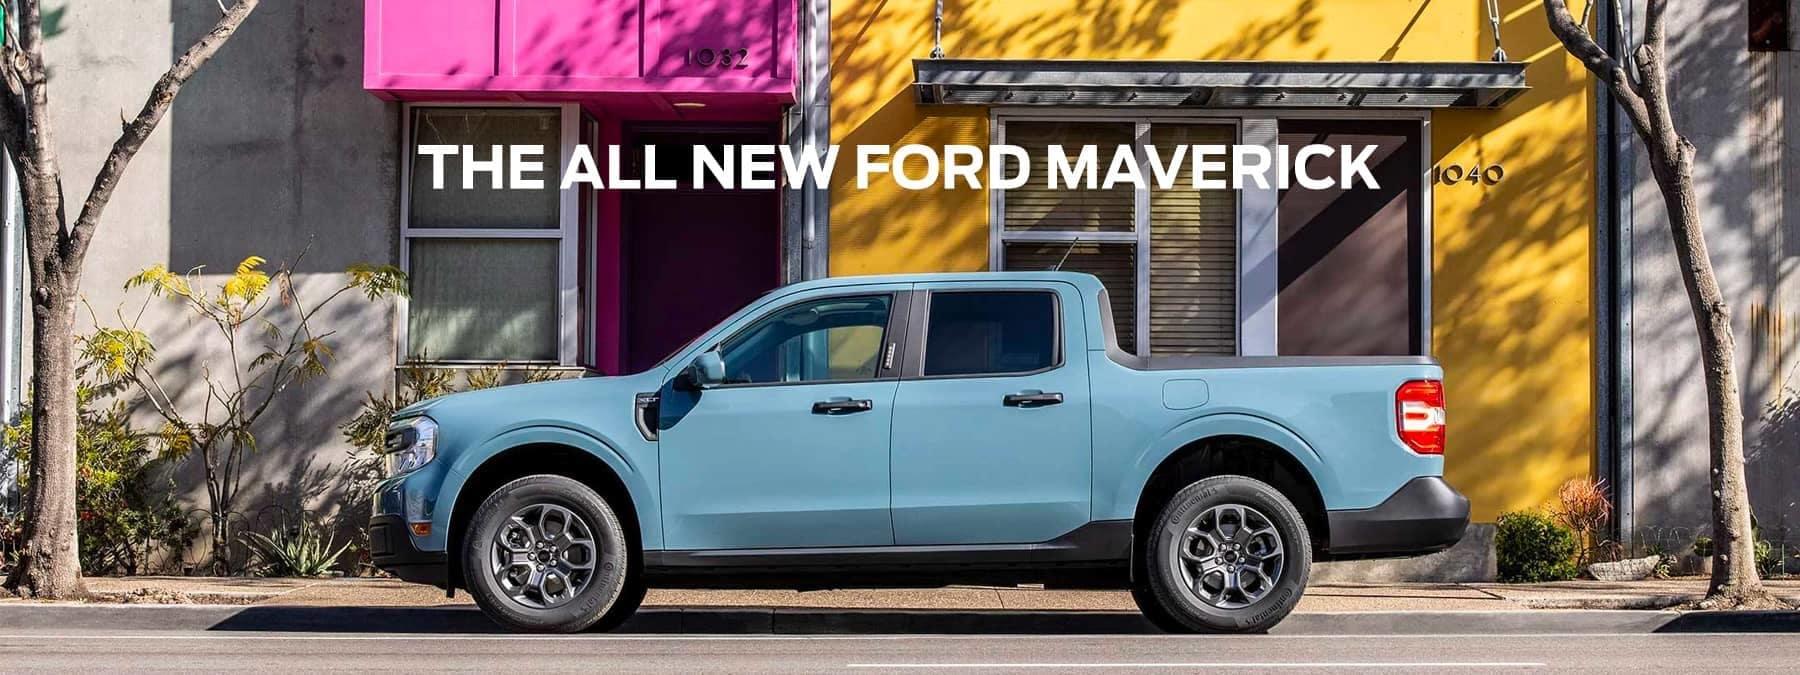 Ford-Maverick-Desktop